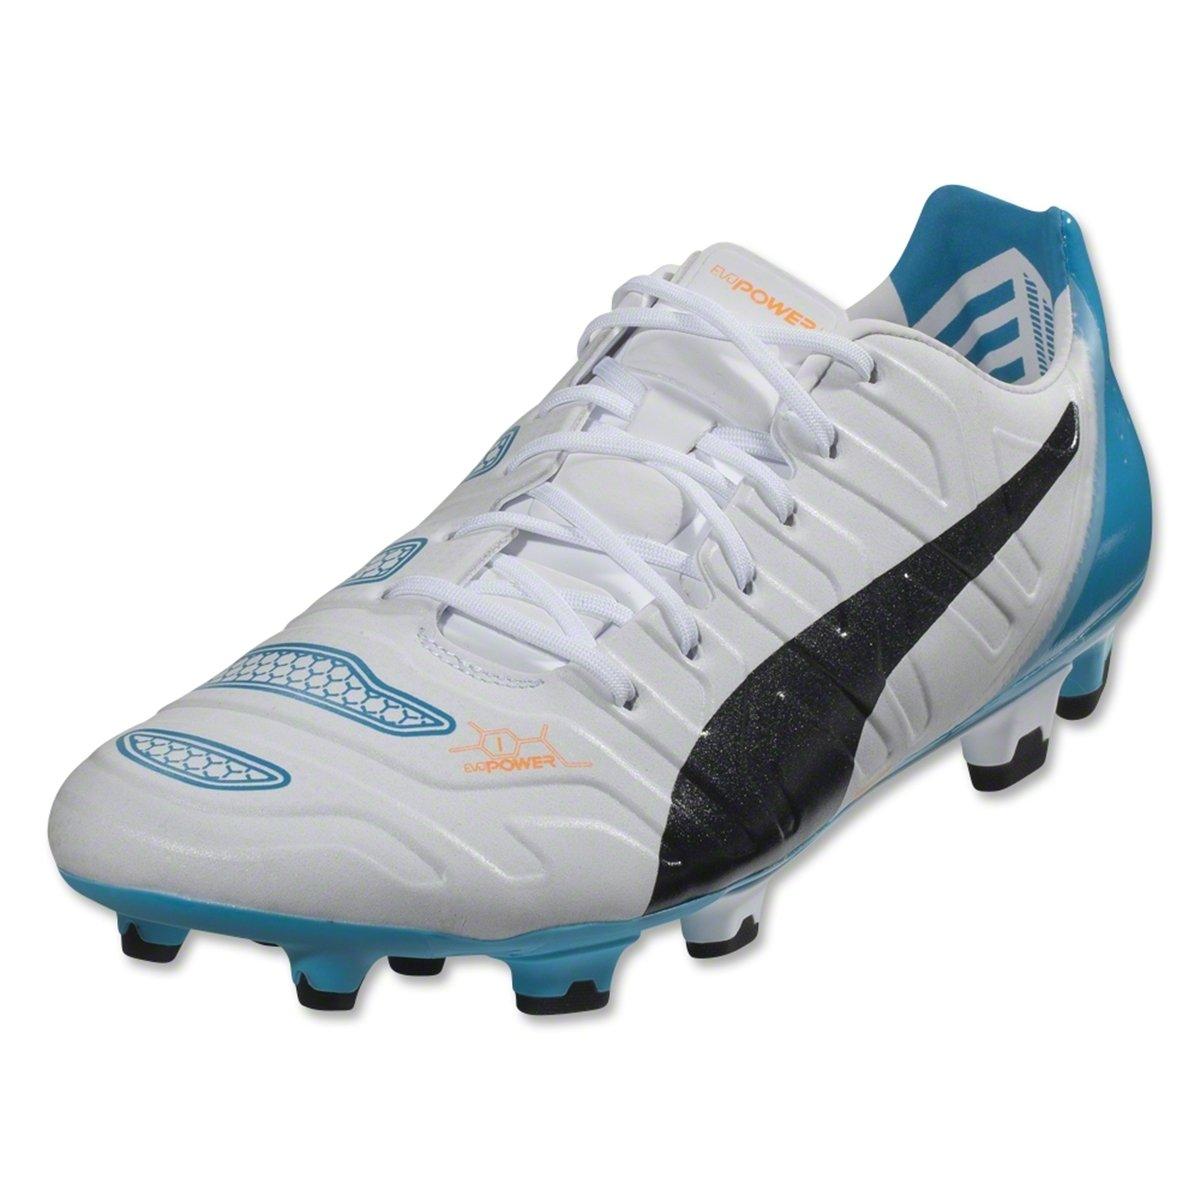 5b332b45d913 Amazon.com | PUMA Mens Evopower 1.2 FG Firm Ground Soccer Cleat | Soccer